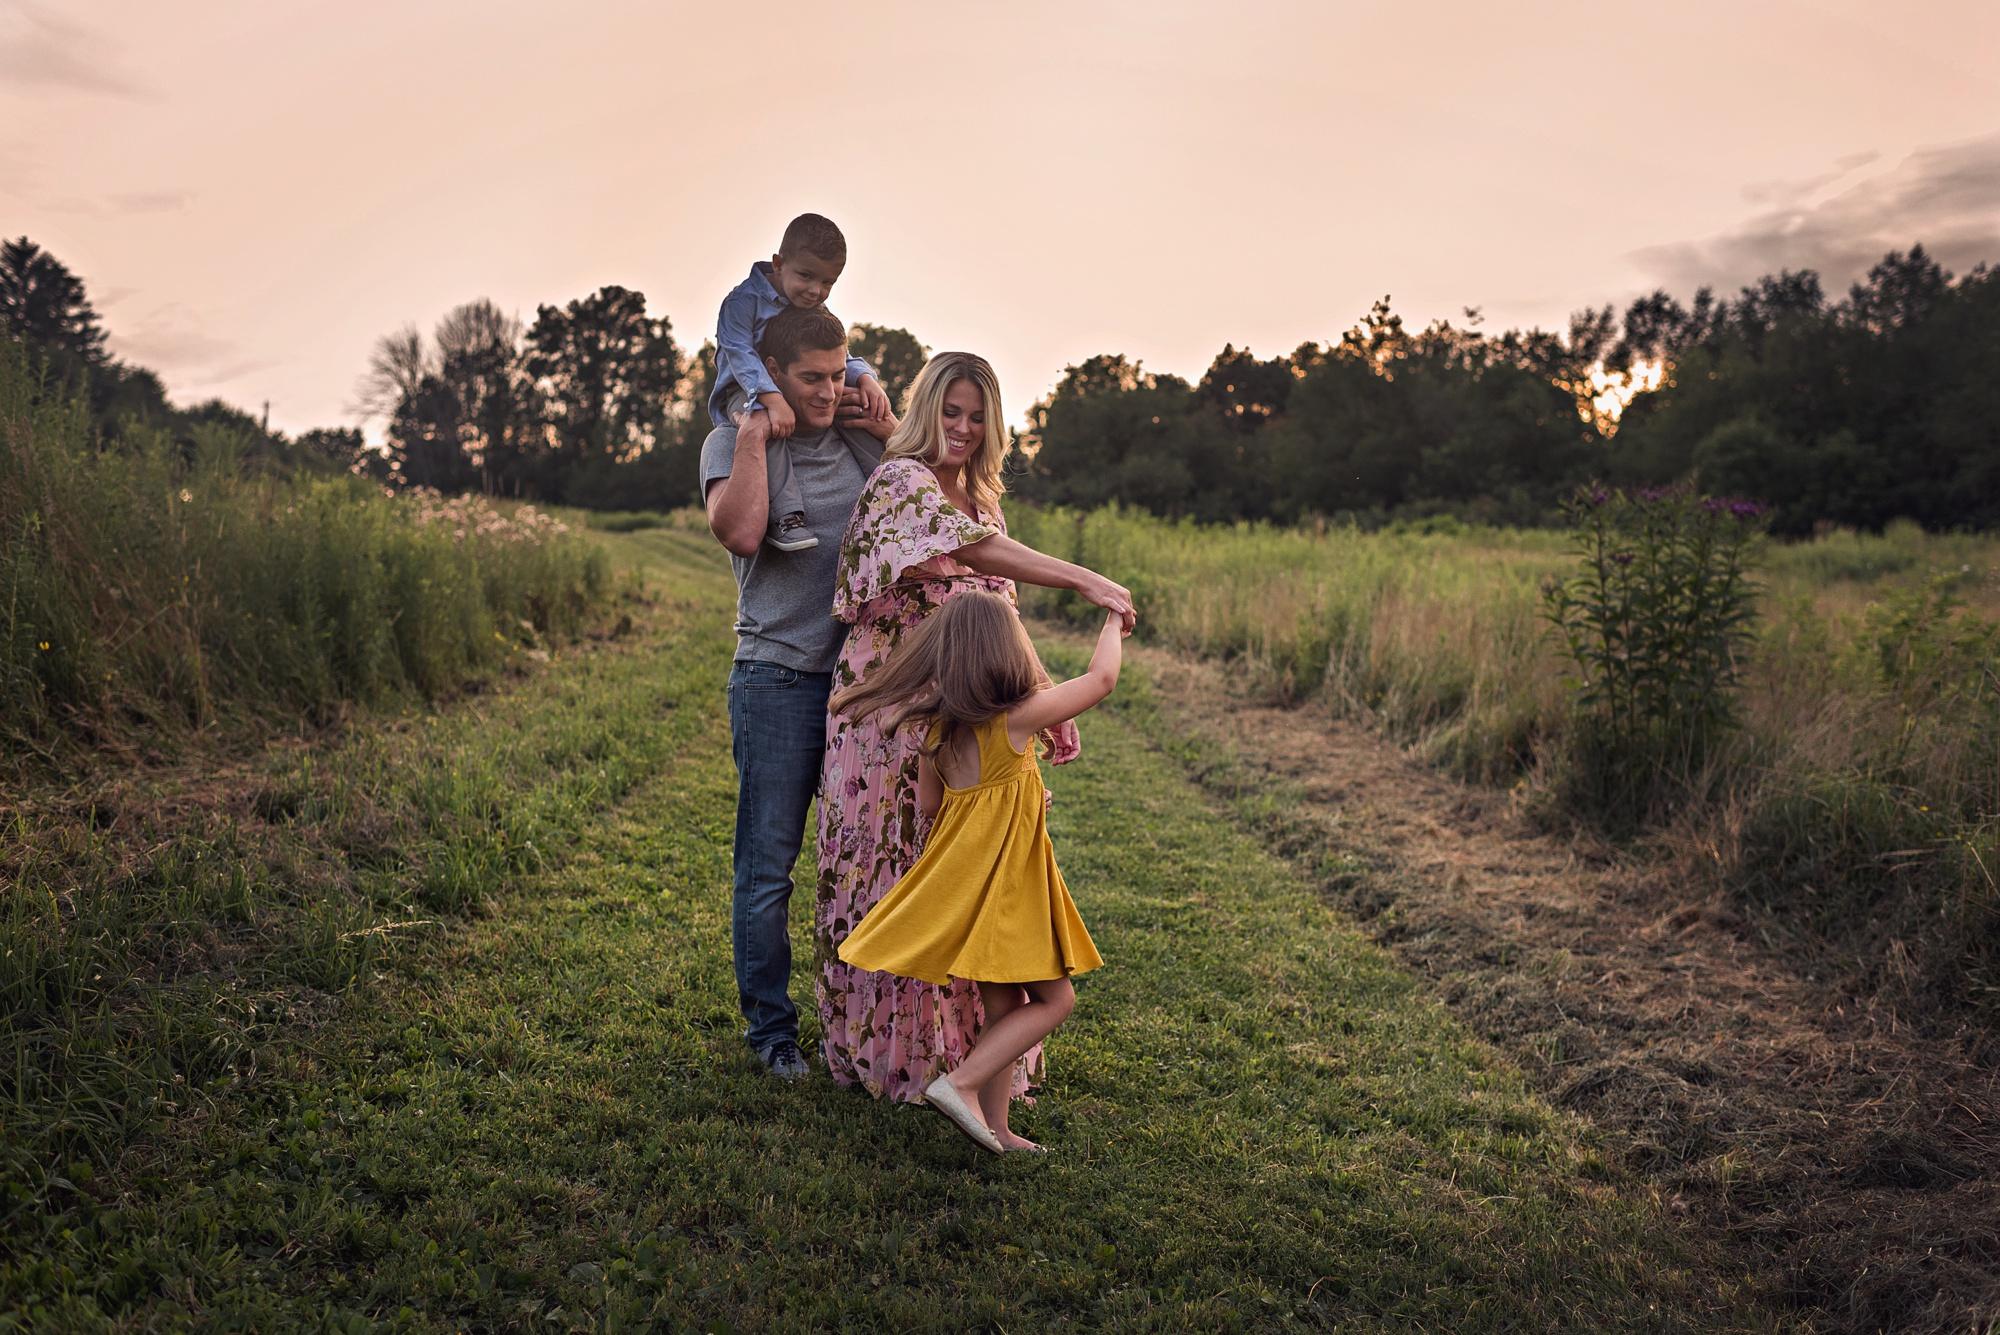 family-maternity-misanko-lauren-grayson-akron-ohio-photographer_0088.jpg